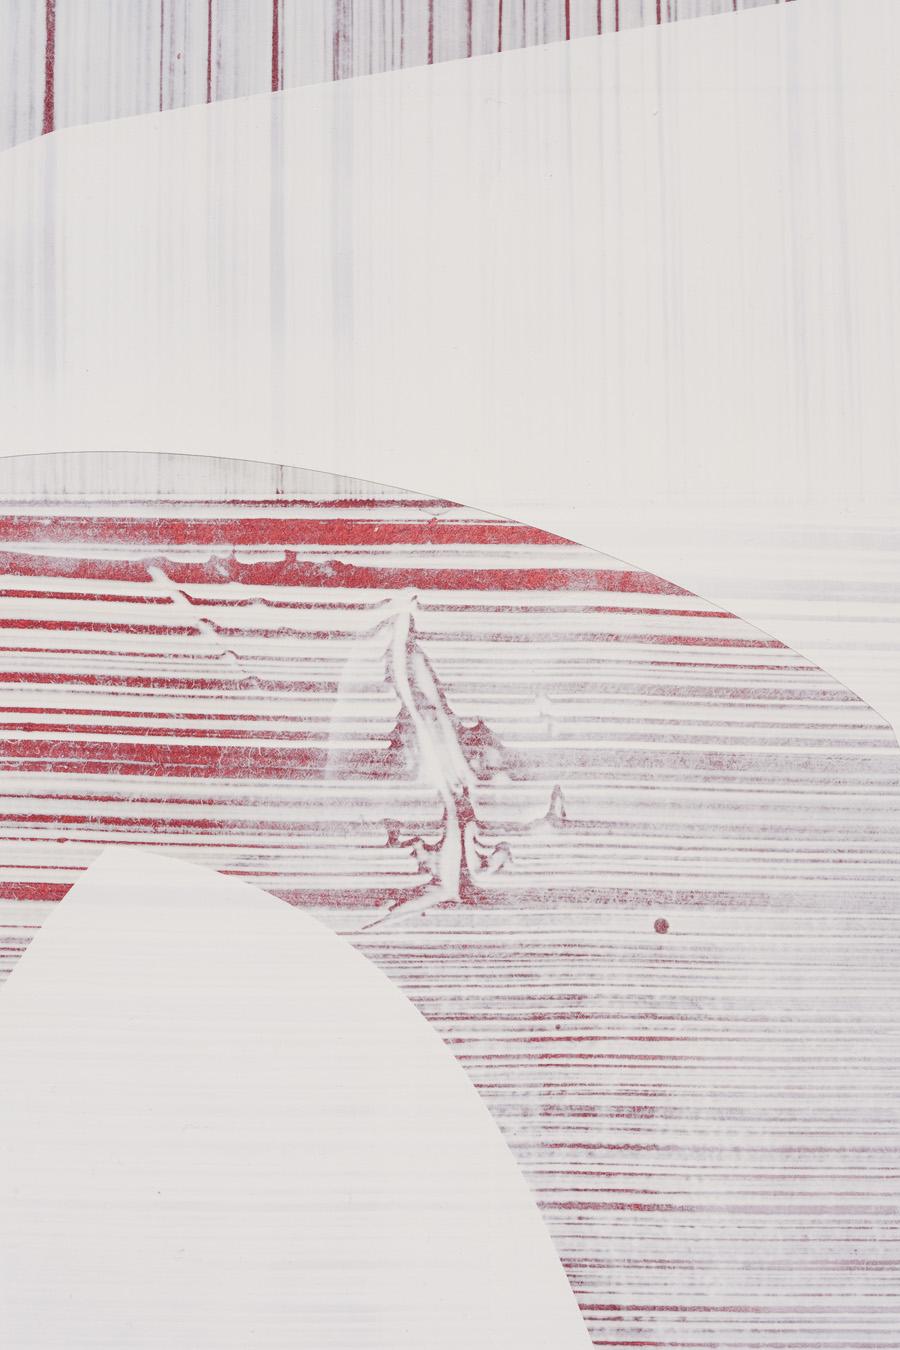 Salton Sea (shore), detail